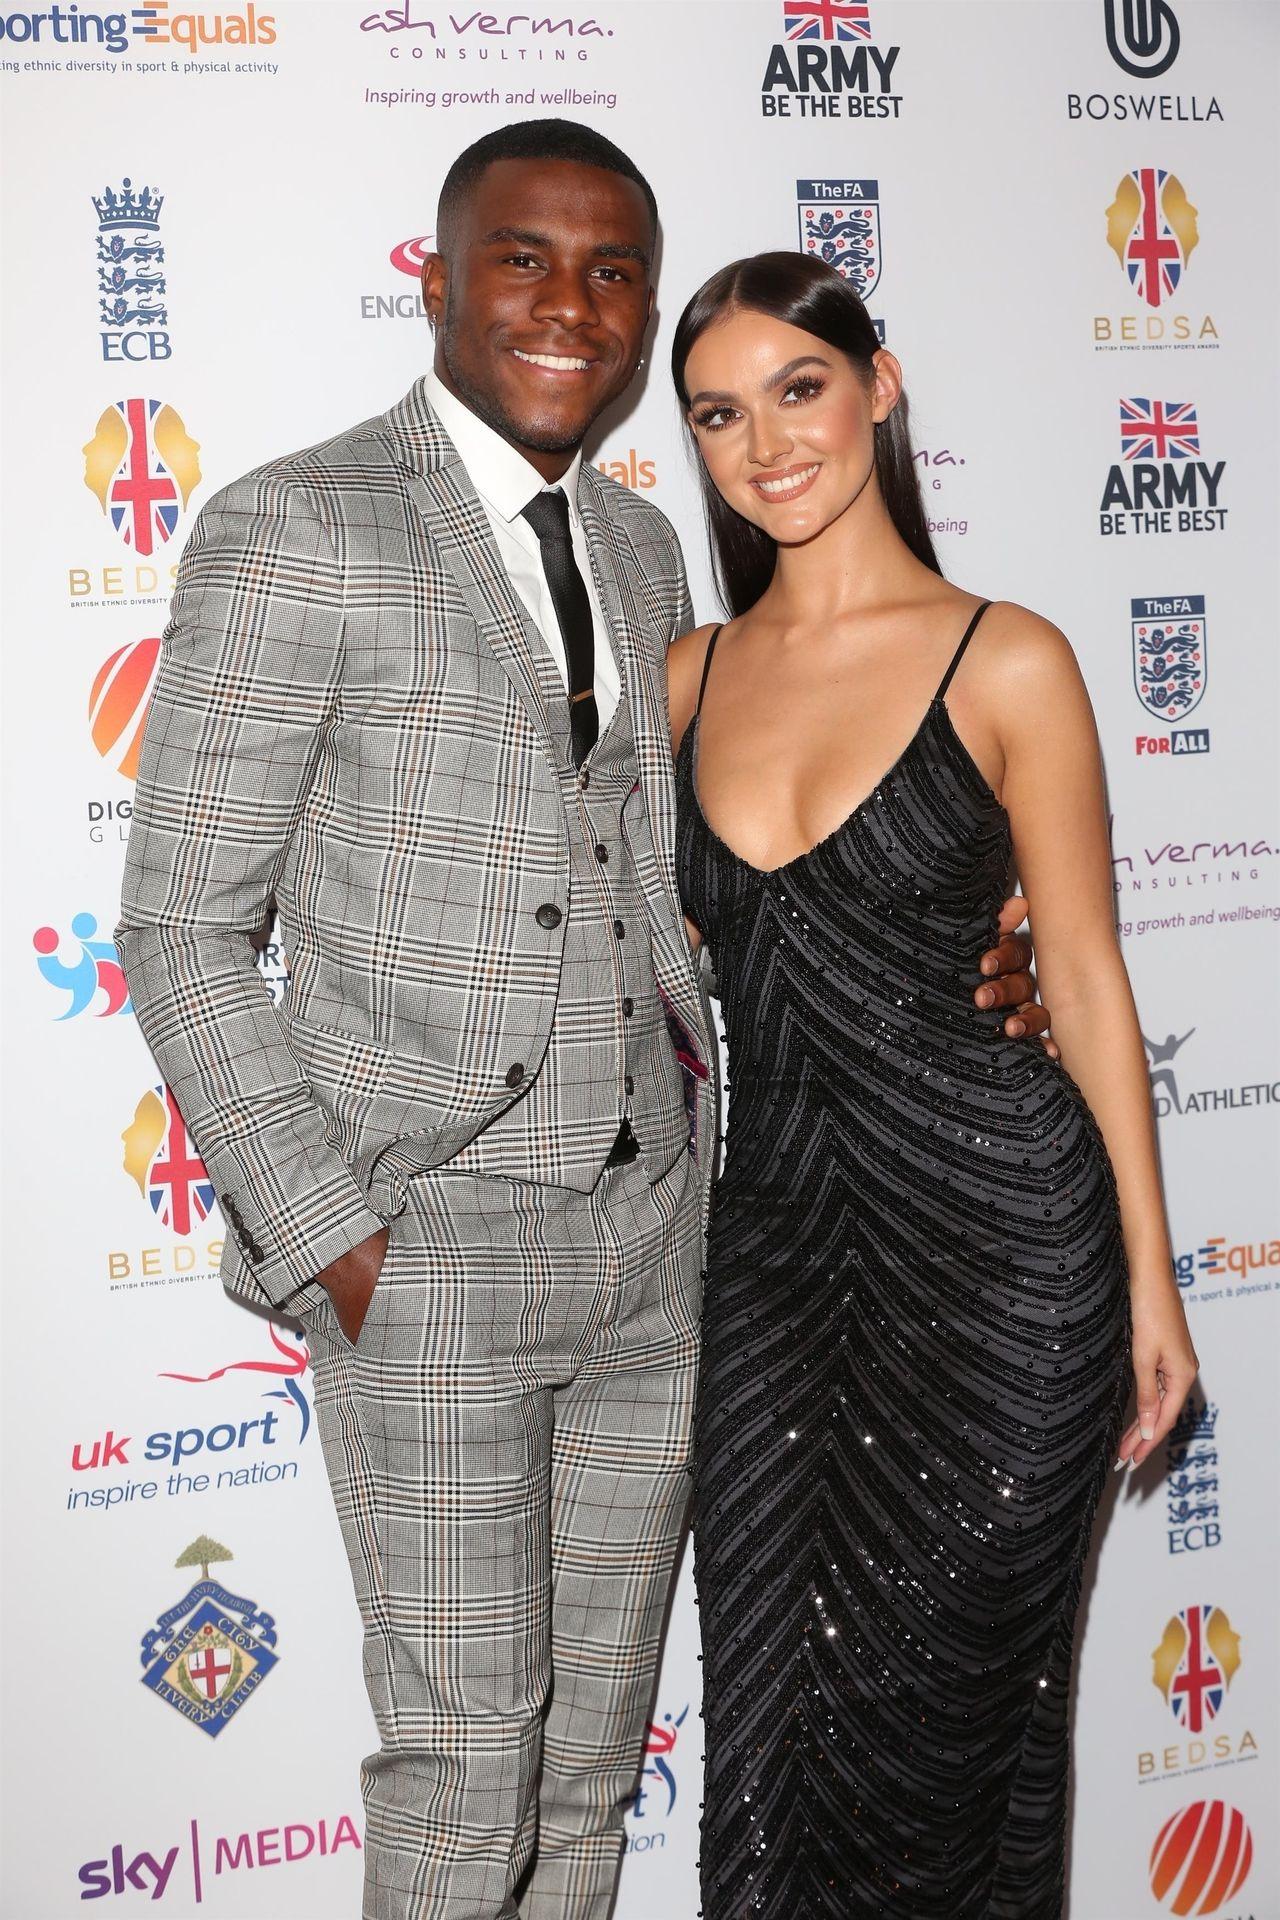 Siannise Fudge & Luke Trotman Are Seen At British Ethnic Diversity Sports Awards 0037